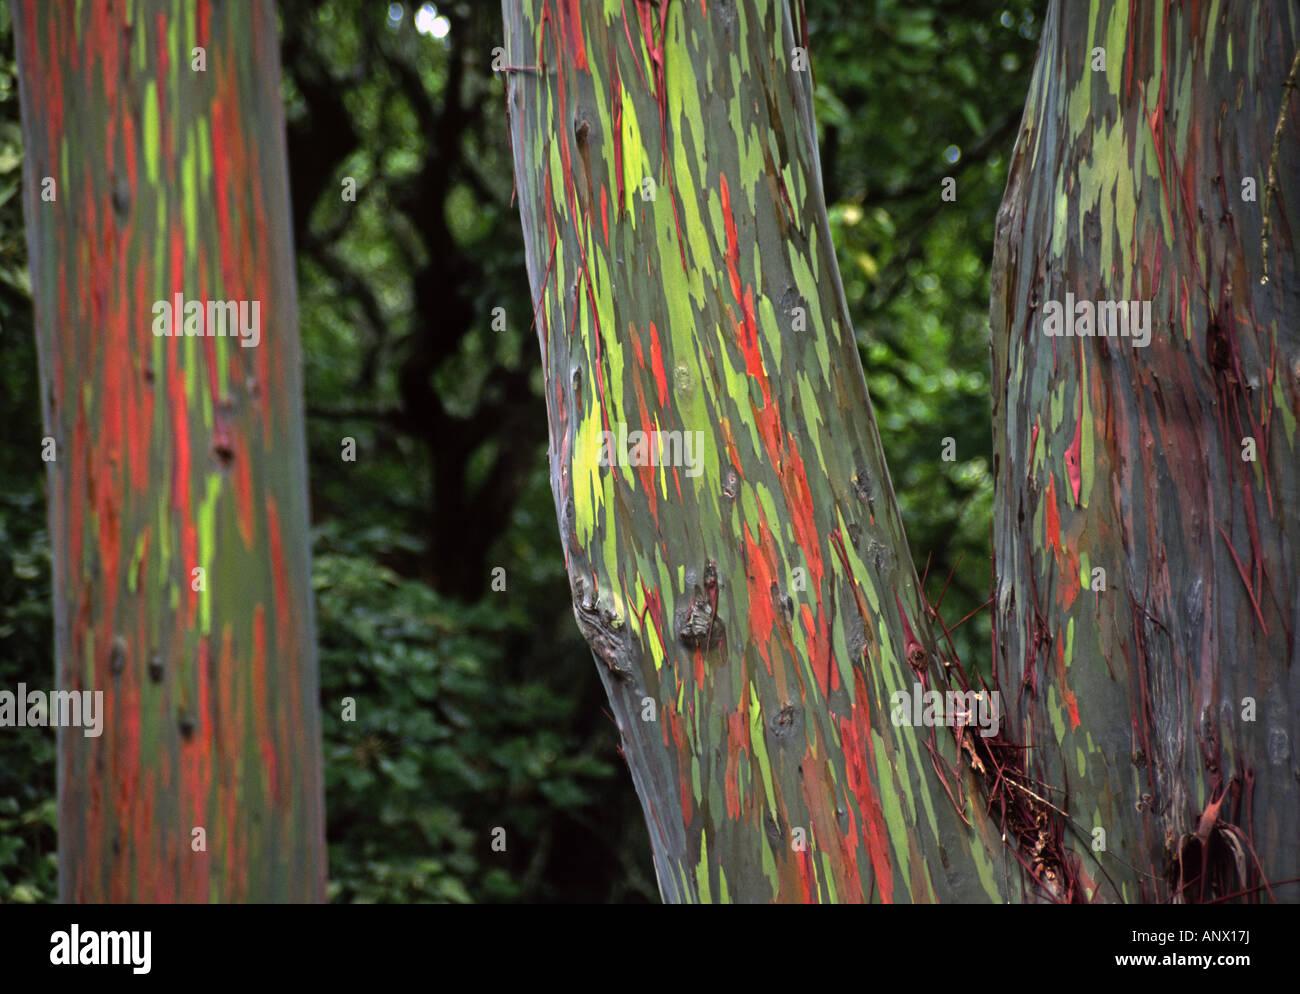 rainbow eucalyptus, Painted eucalyptus (Eucalyptus deglupta), The green and red bark is one of natures incredible - Stock Image